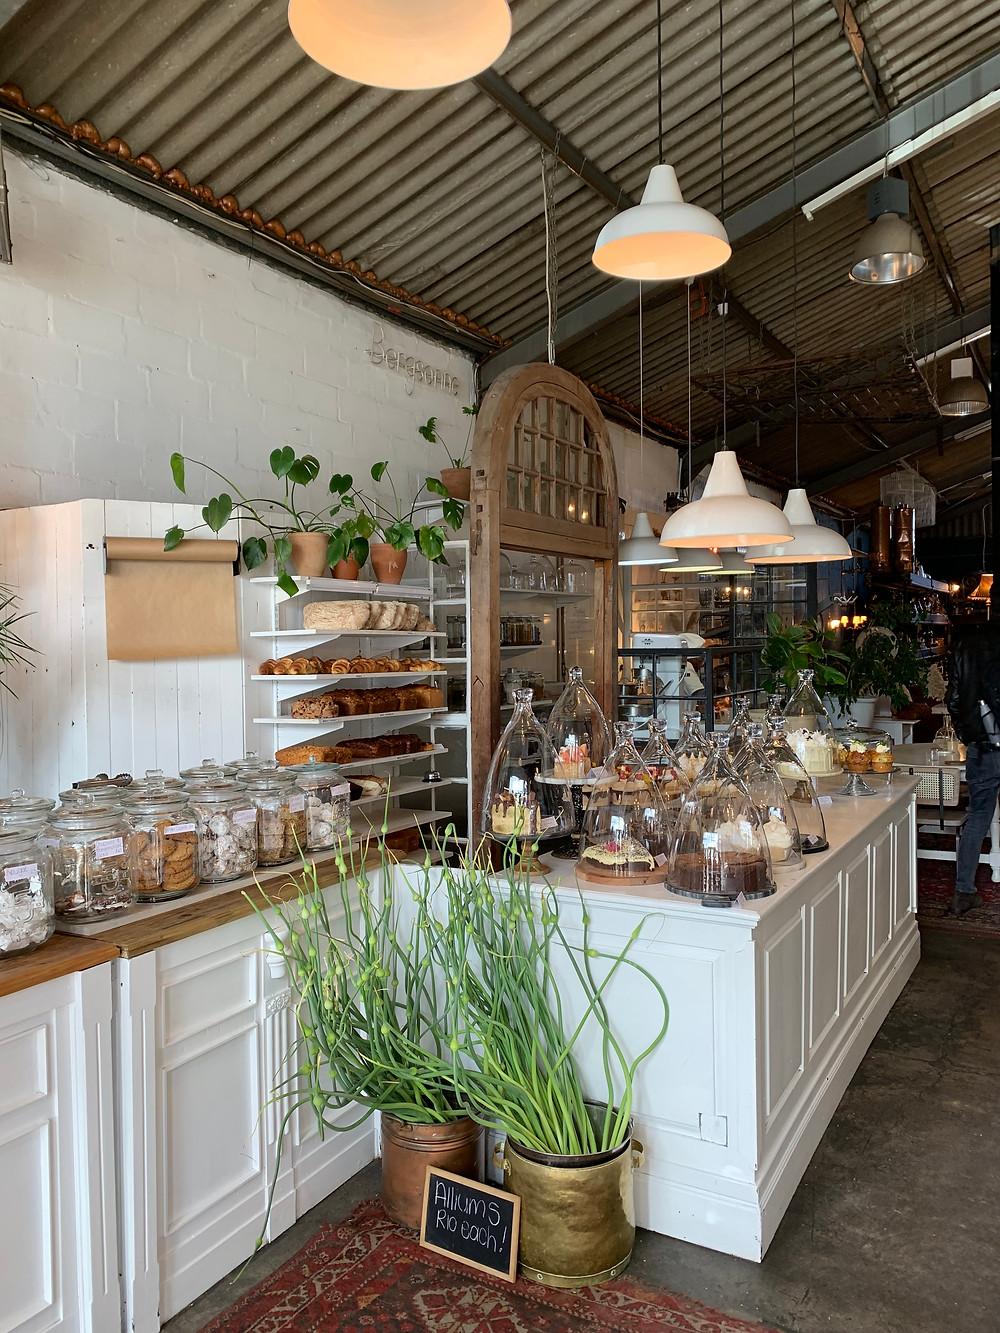 Wunderschöner Coffee Shop in Südafrika, nahe Kapstadt